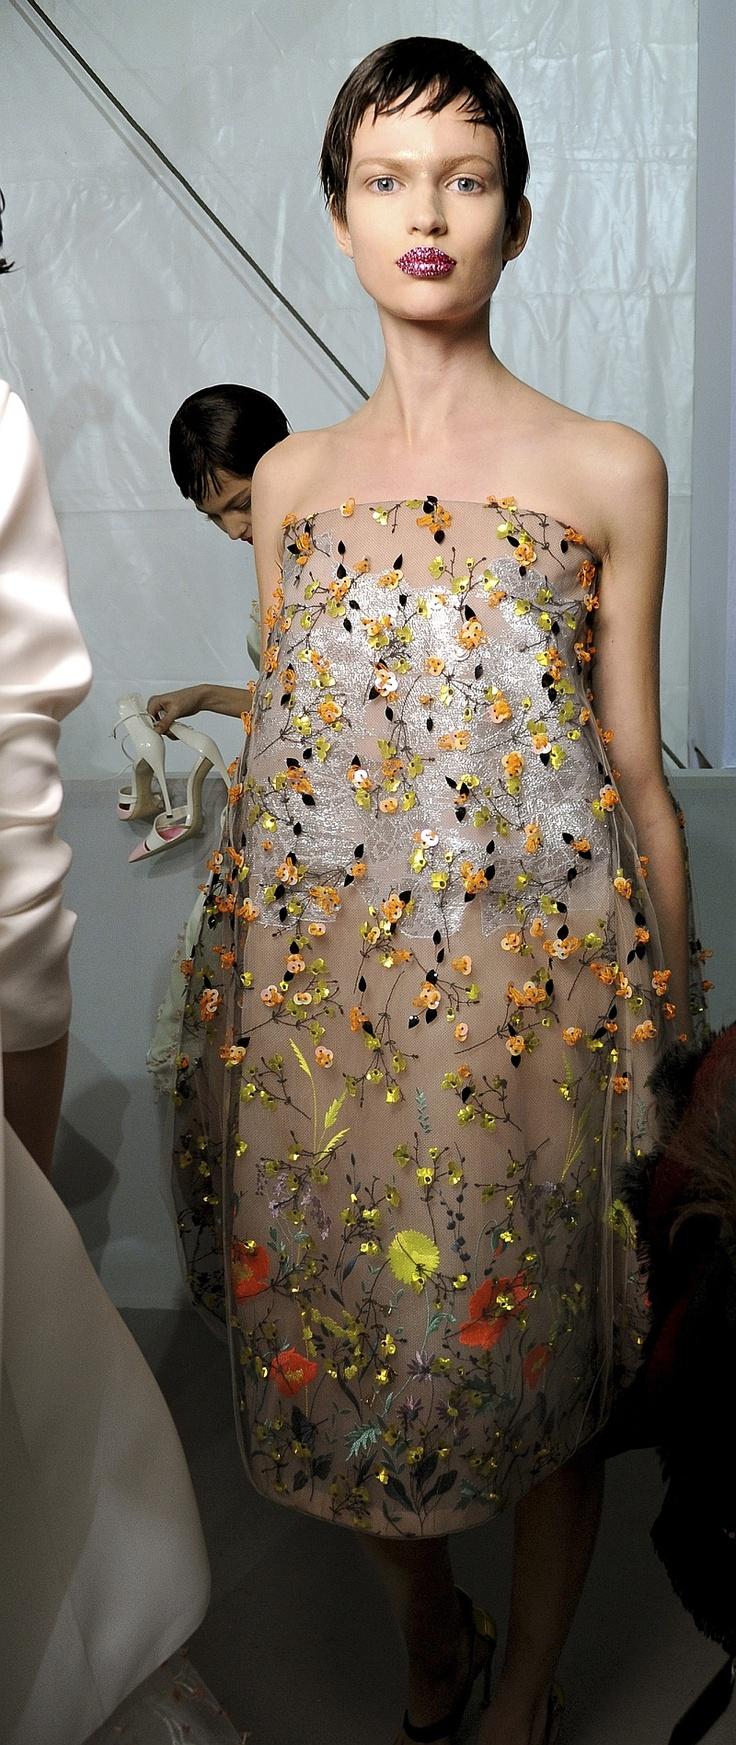 best fabric manipulation images on pinterest fashion design